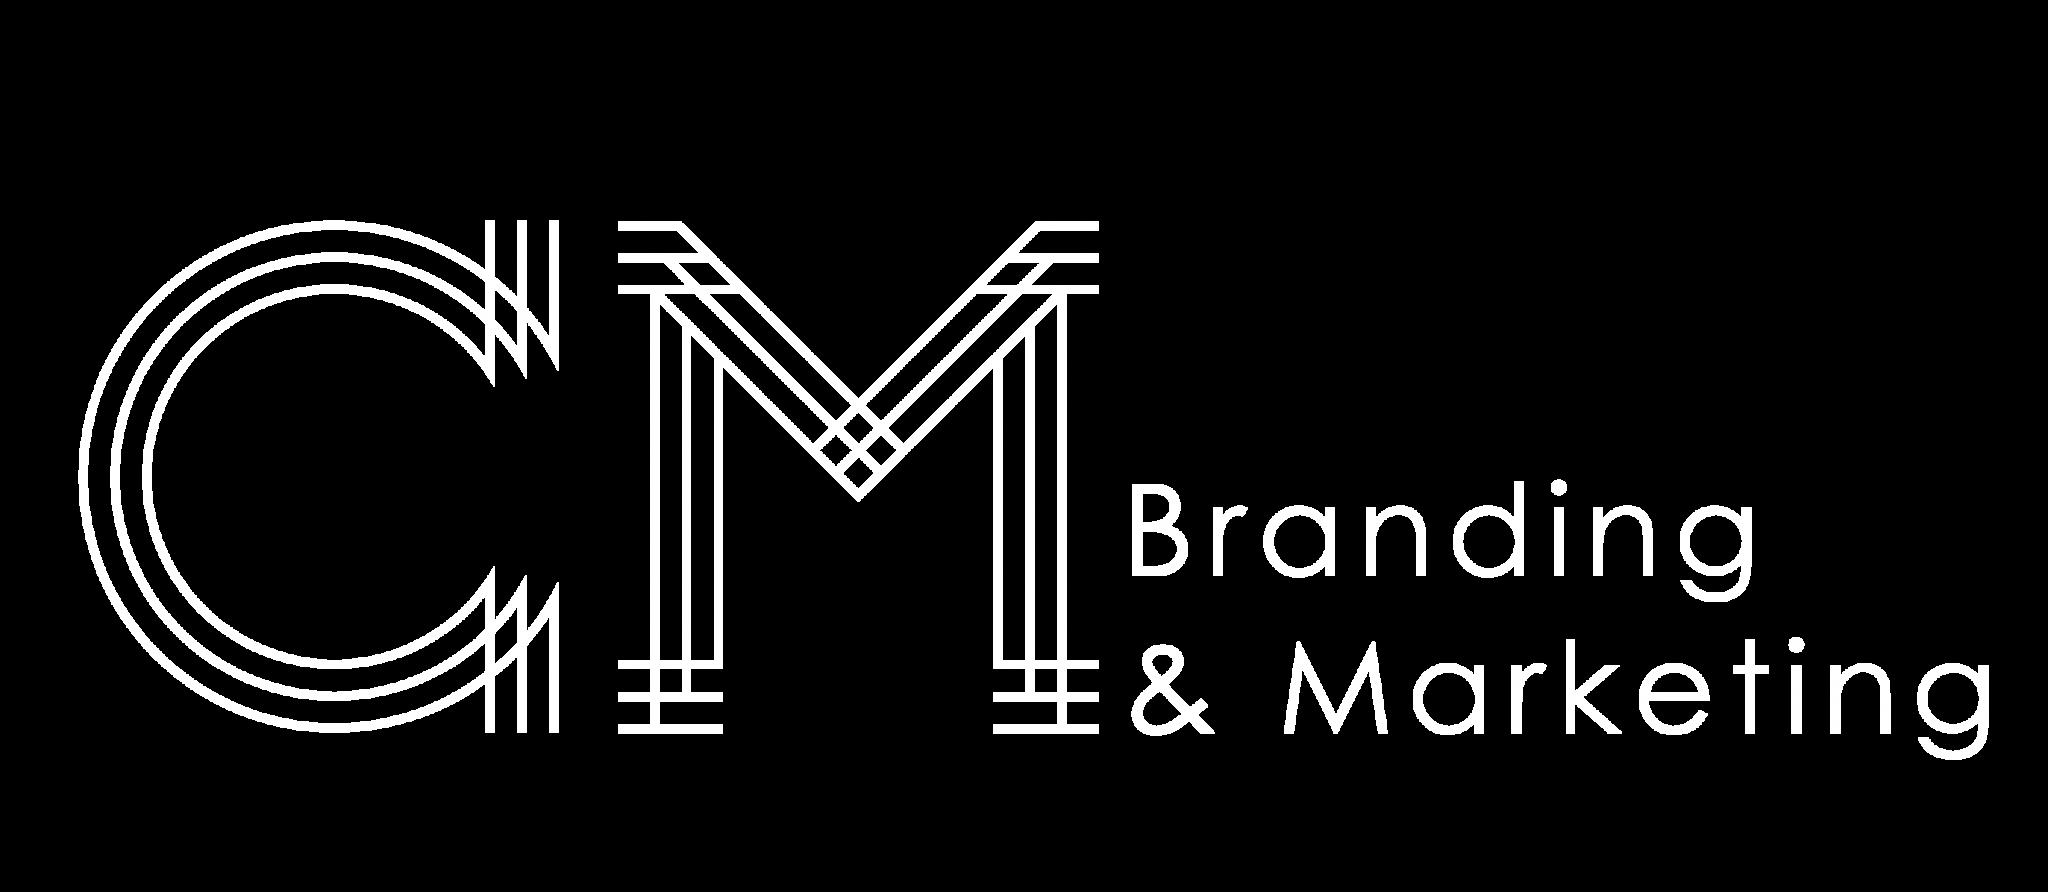 网站白色logo-01